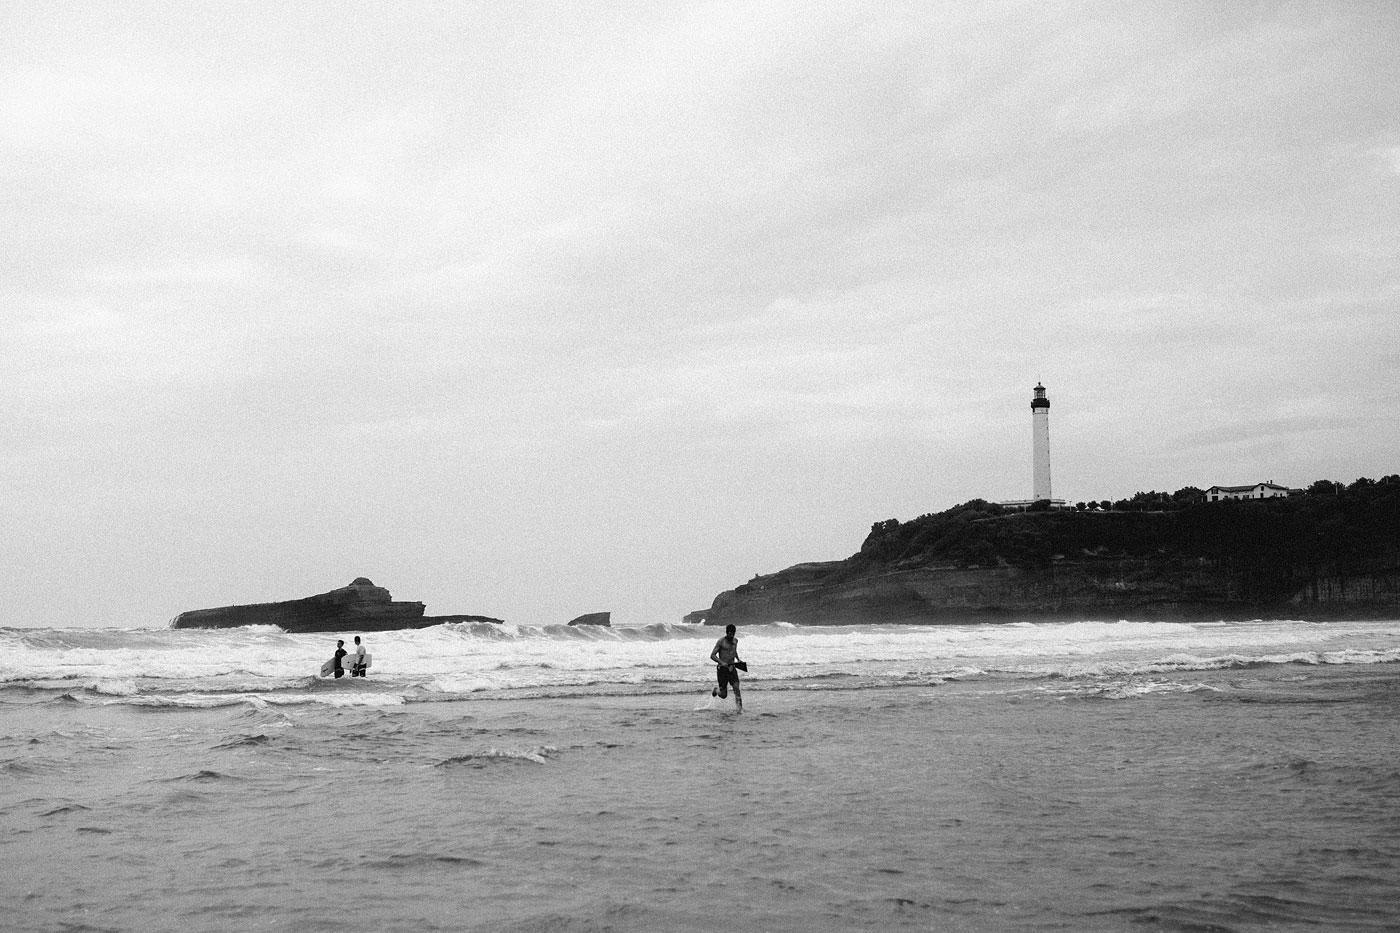 Biarritz, France // 2012